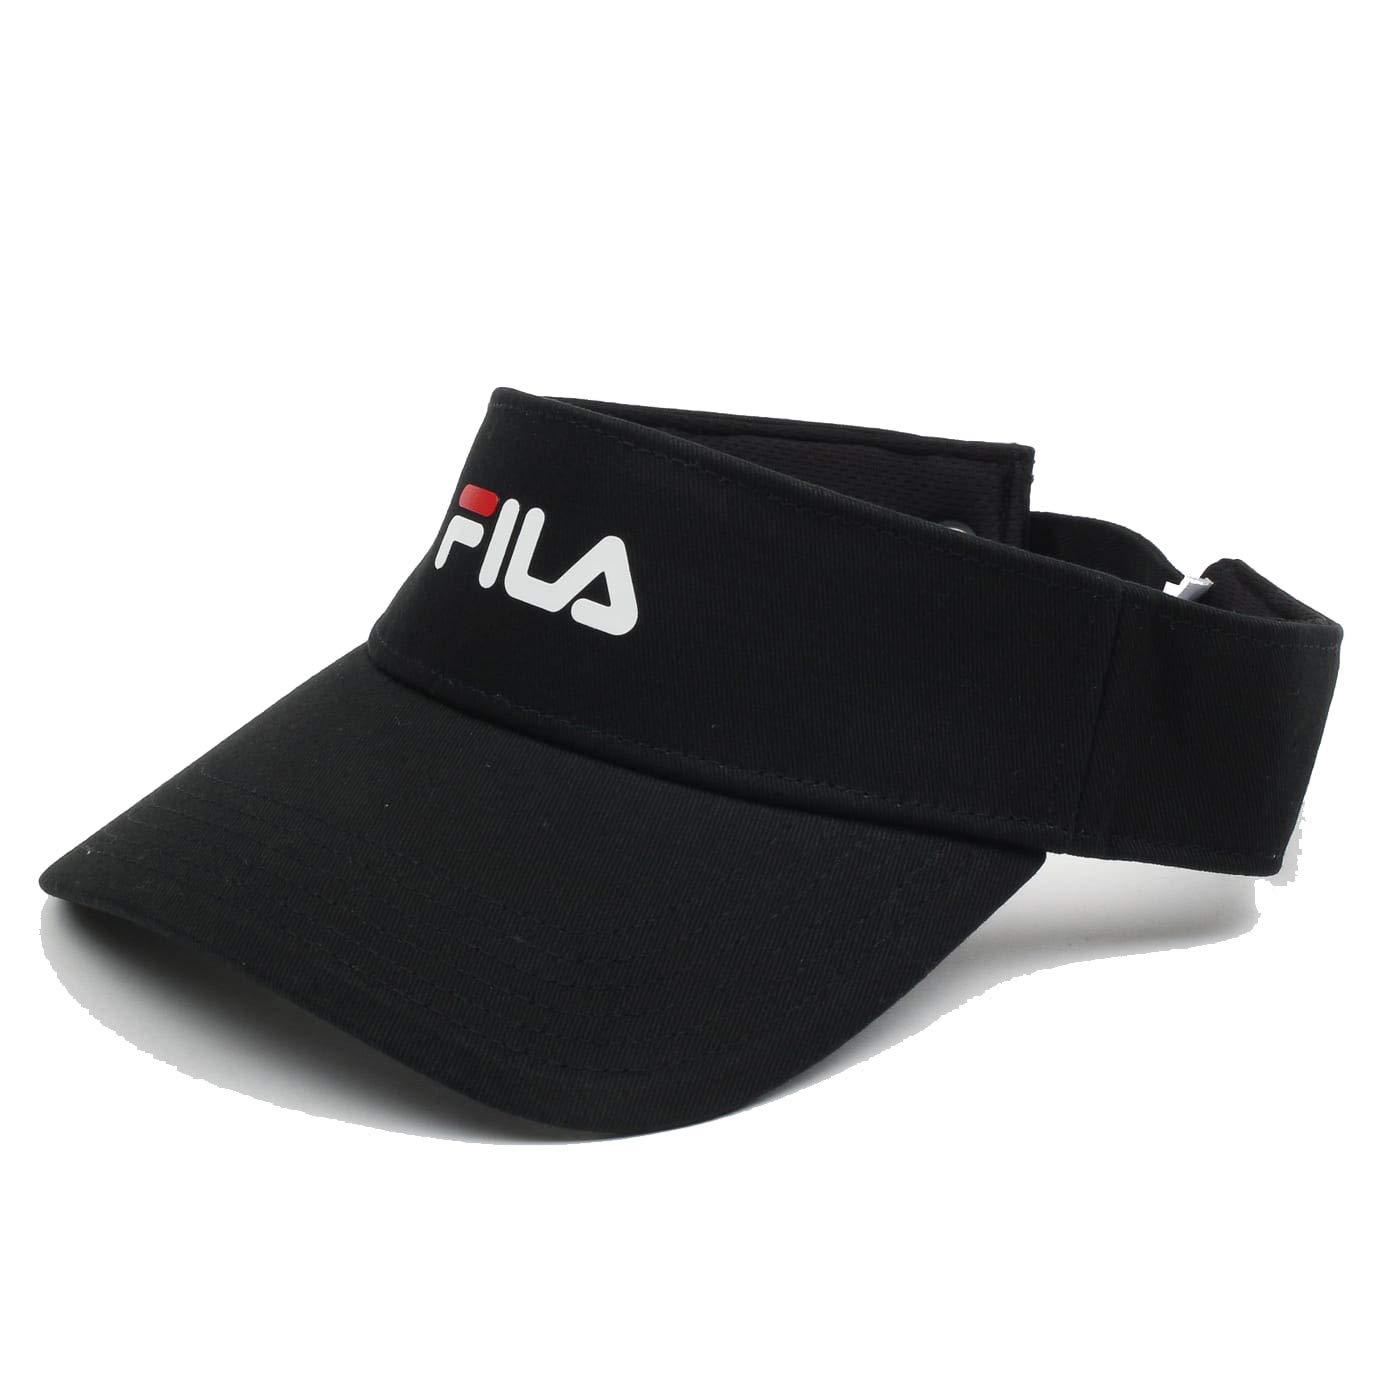 Fila Heritage Cotton Twill Visor Cap Hat Black la912562-001 (Size OS) by Fila